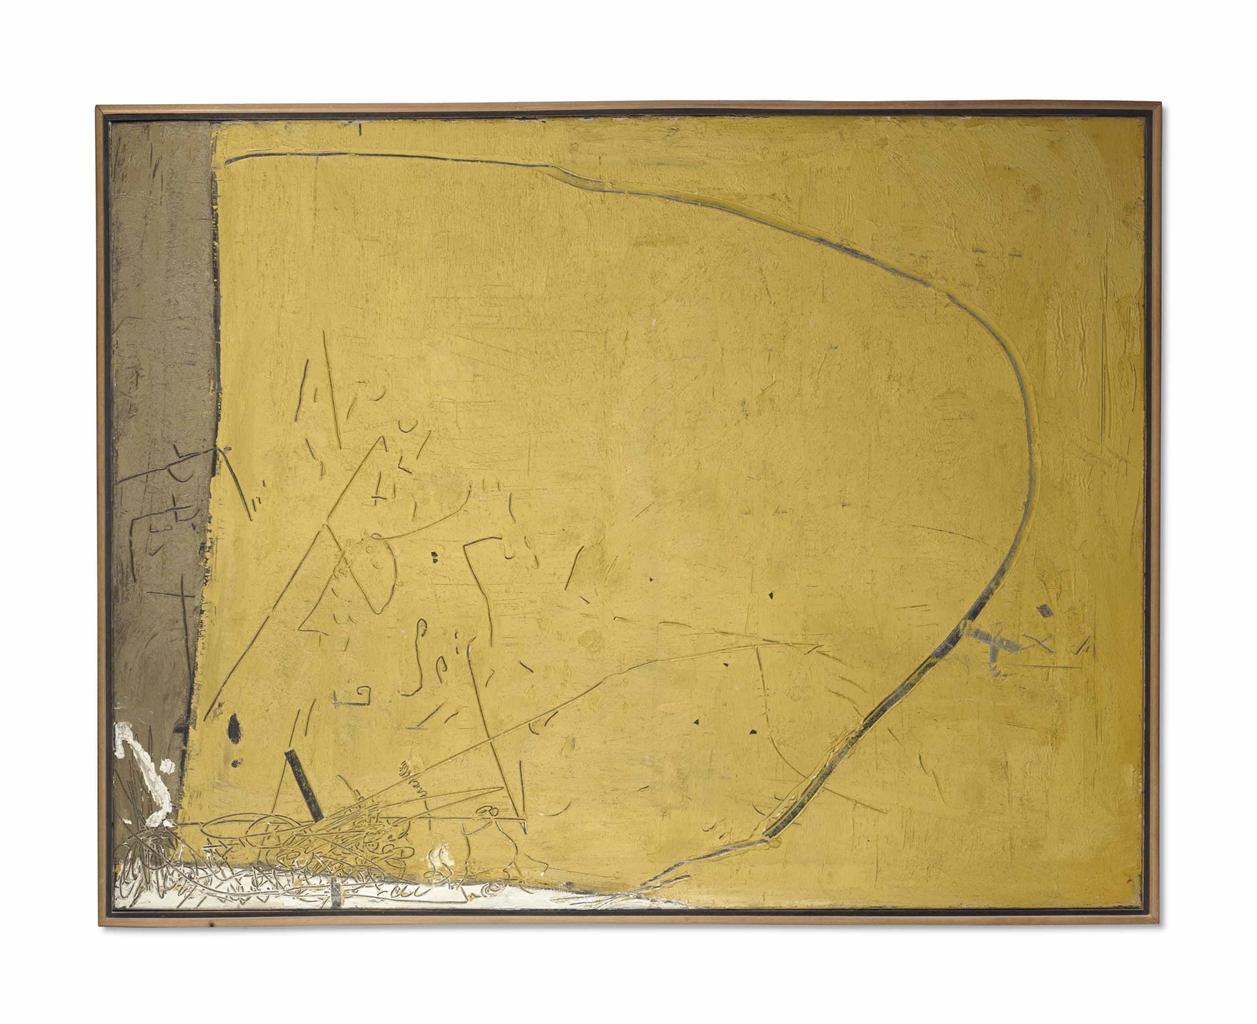 Antoni Tapies-Peinture Jaune No. Xxiv-1955